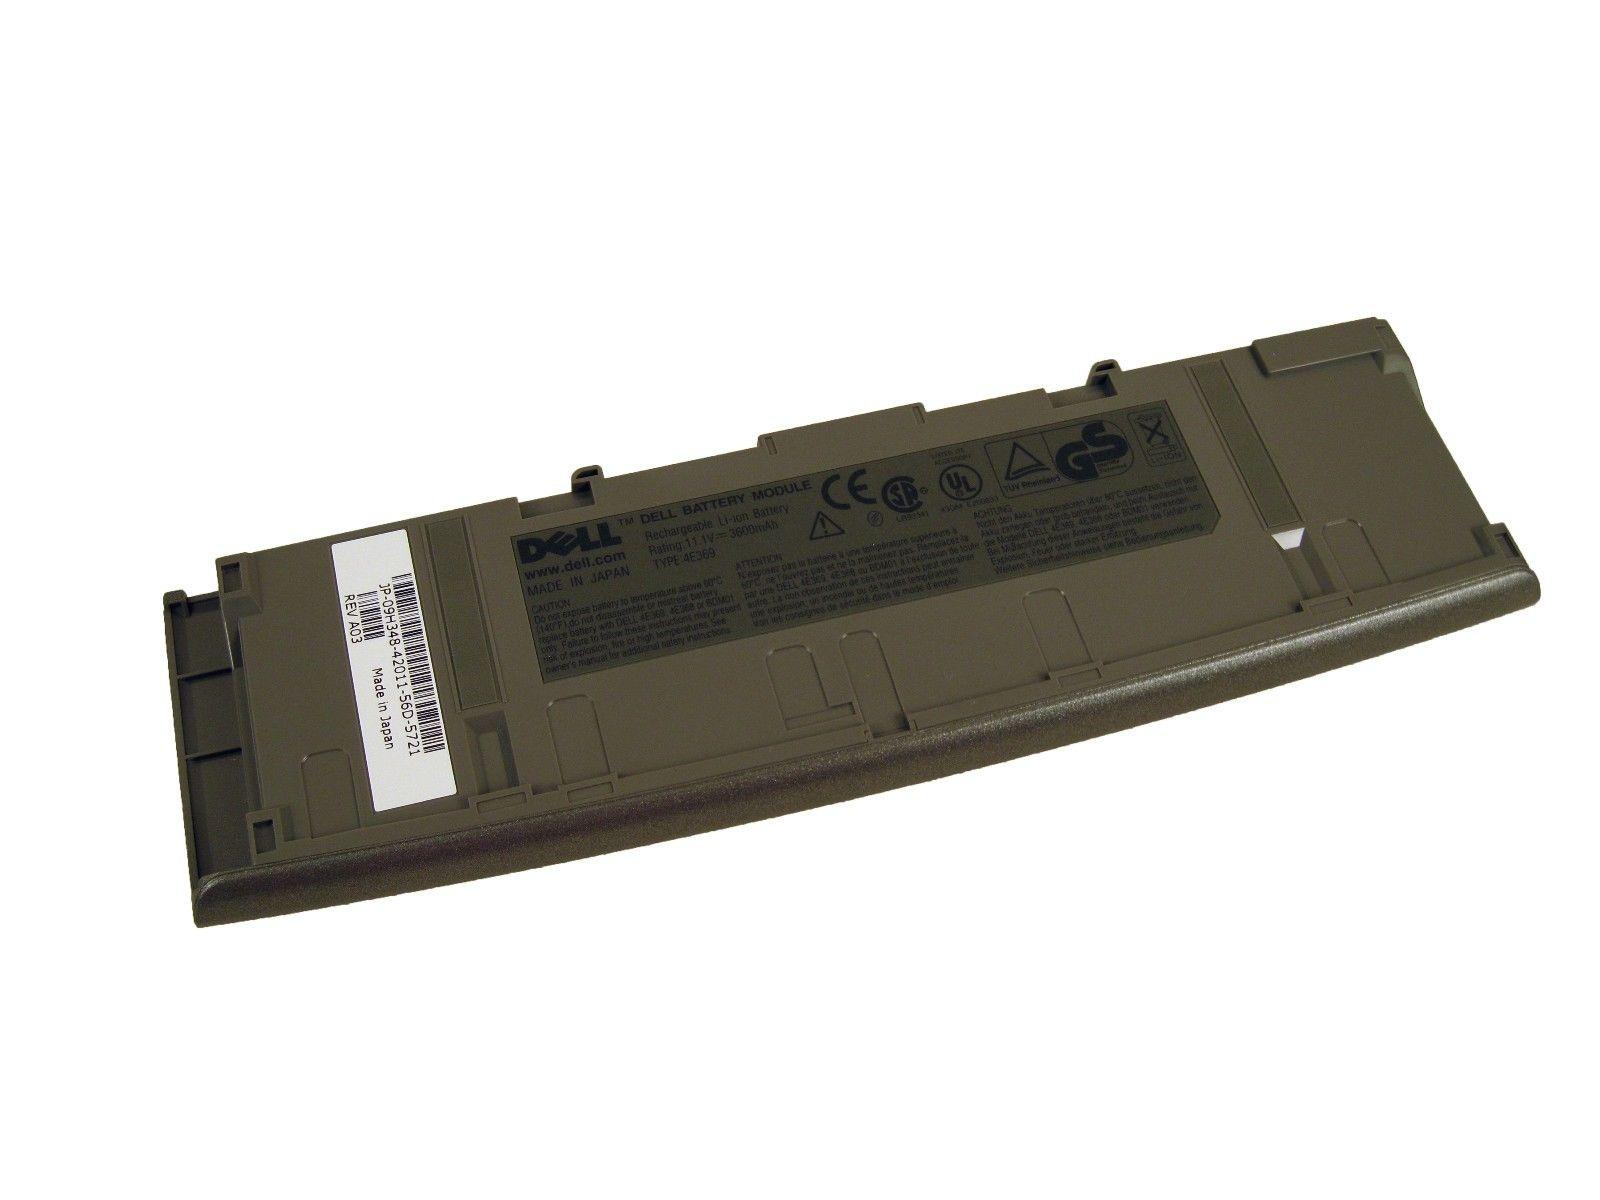 Dell 9H348 Genuine Latitude C400 11.1V Laptop Battery 4E369